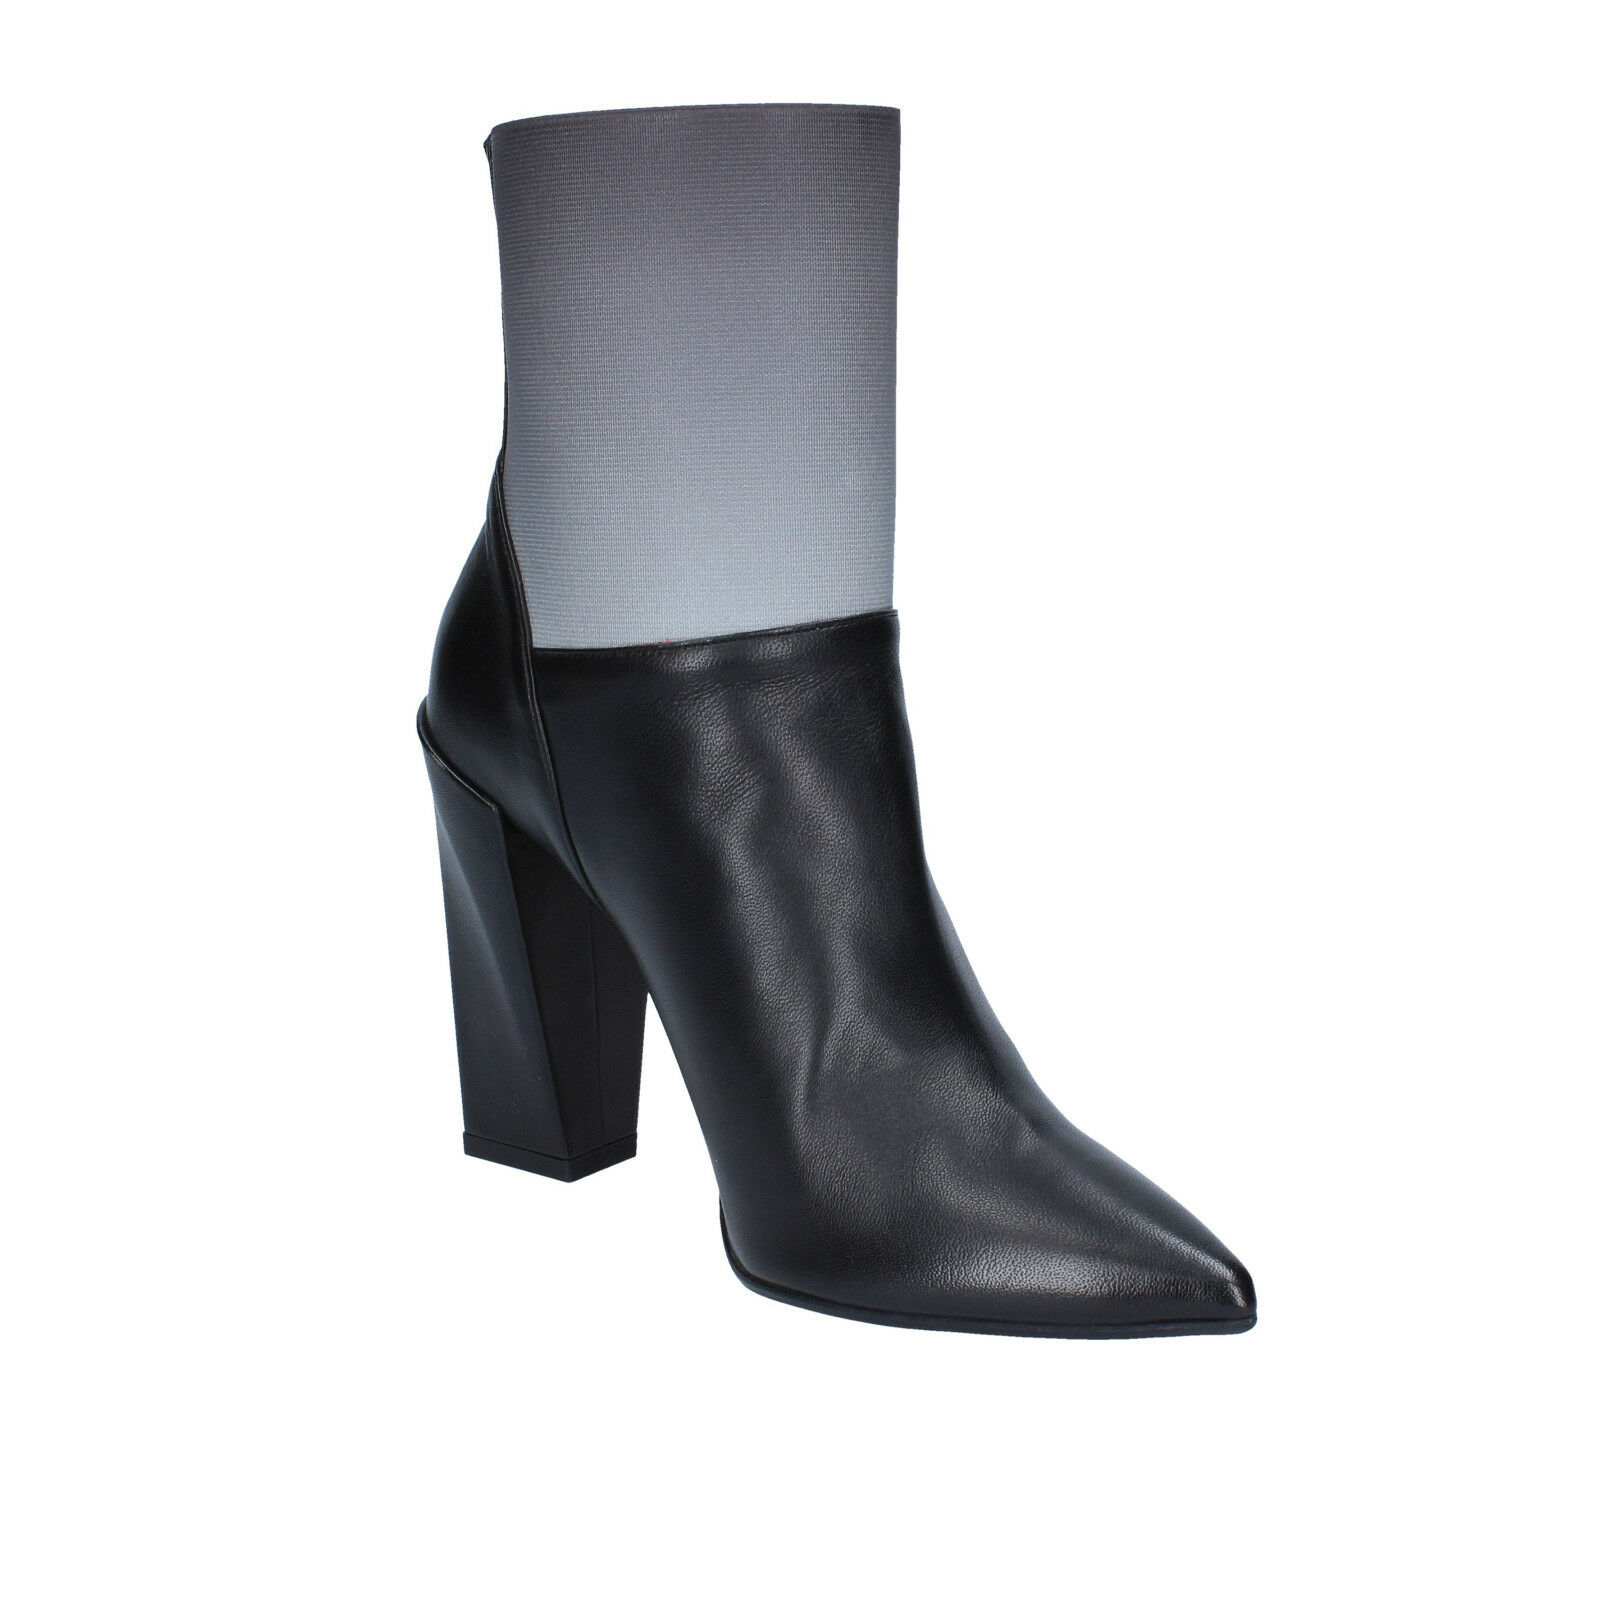 Damen schuhe stiefeletten GIANNI MARRA 36 EU stiefeletten schuhe schwarz grau leder textil BY766-36 7355a0